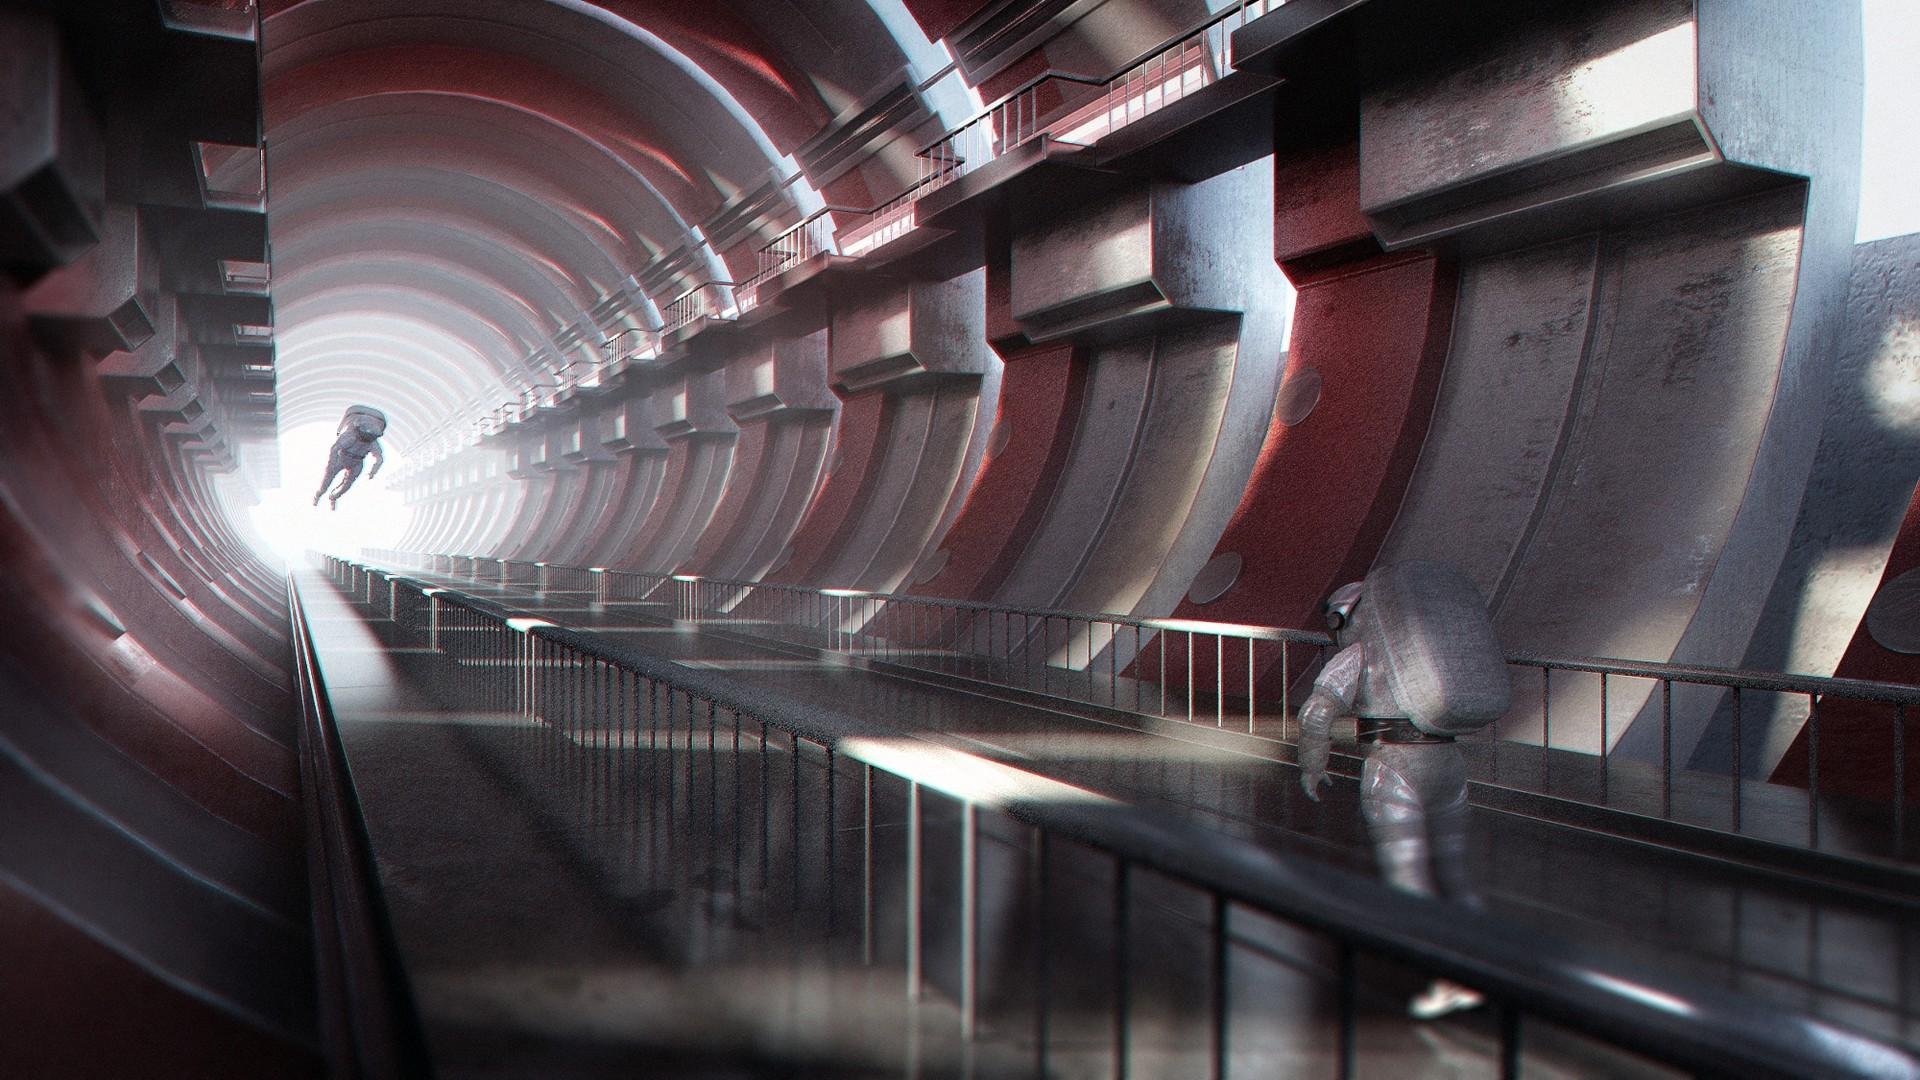 Wai kin lam av redtunnel